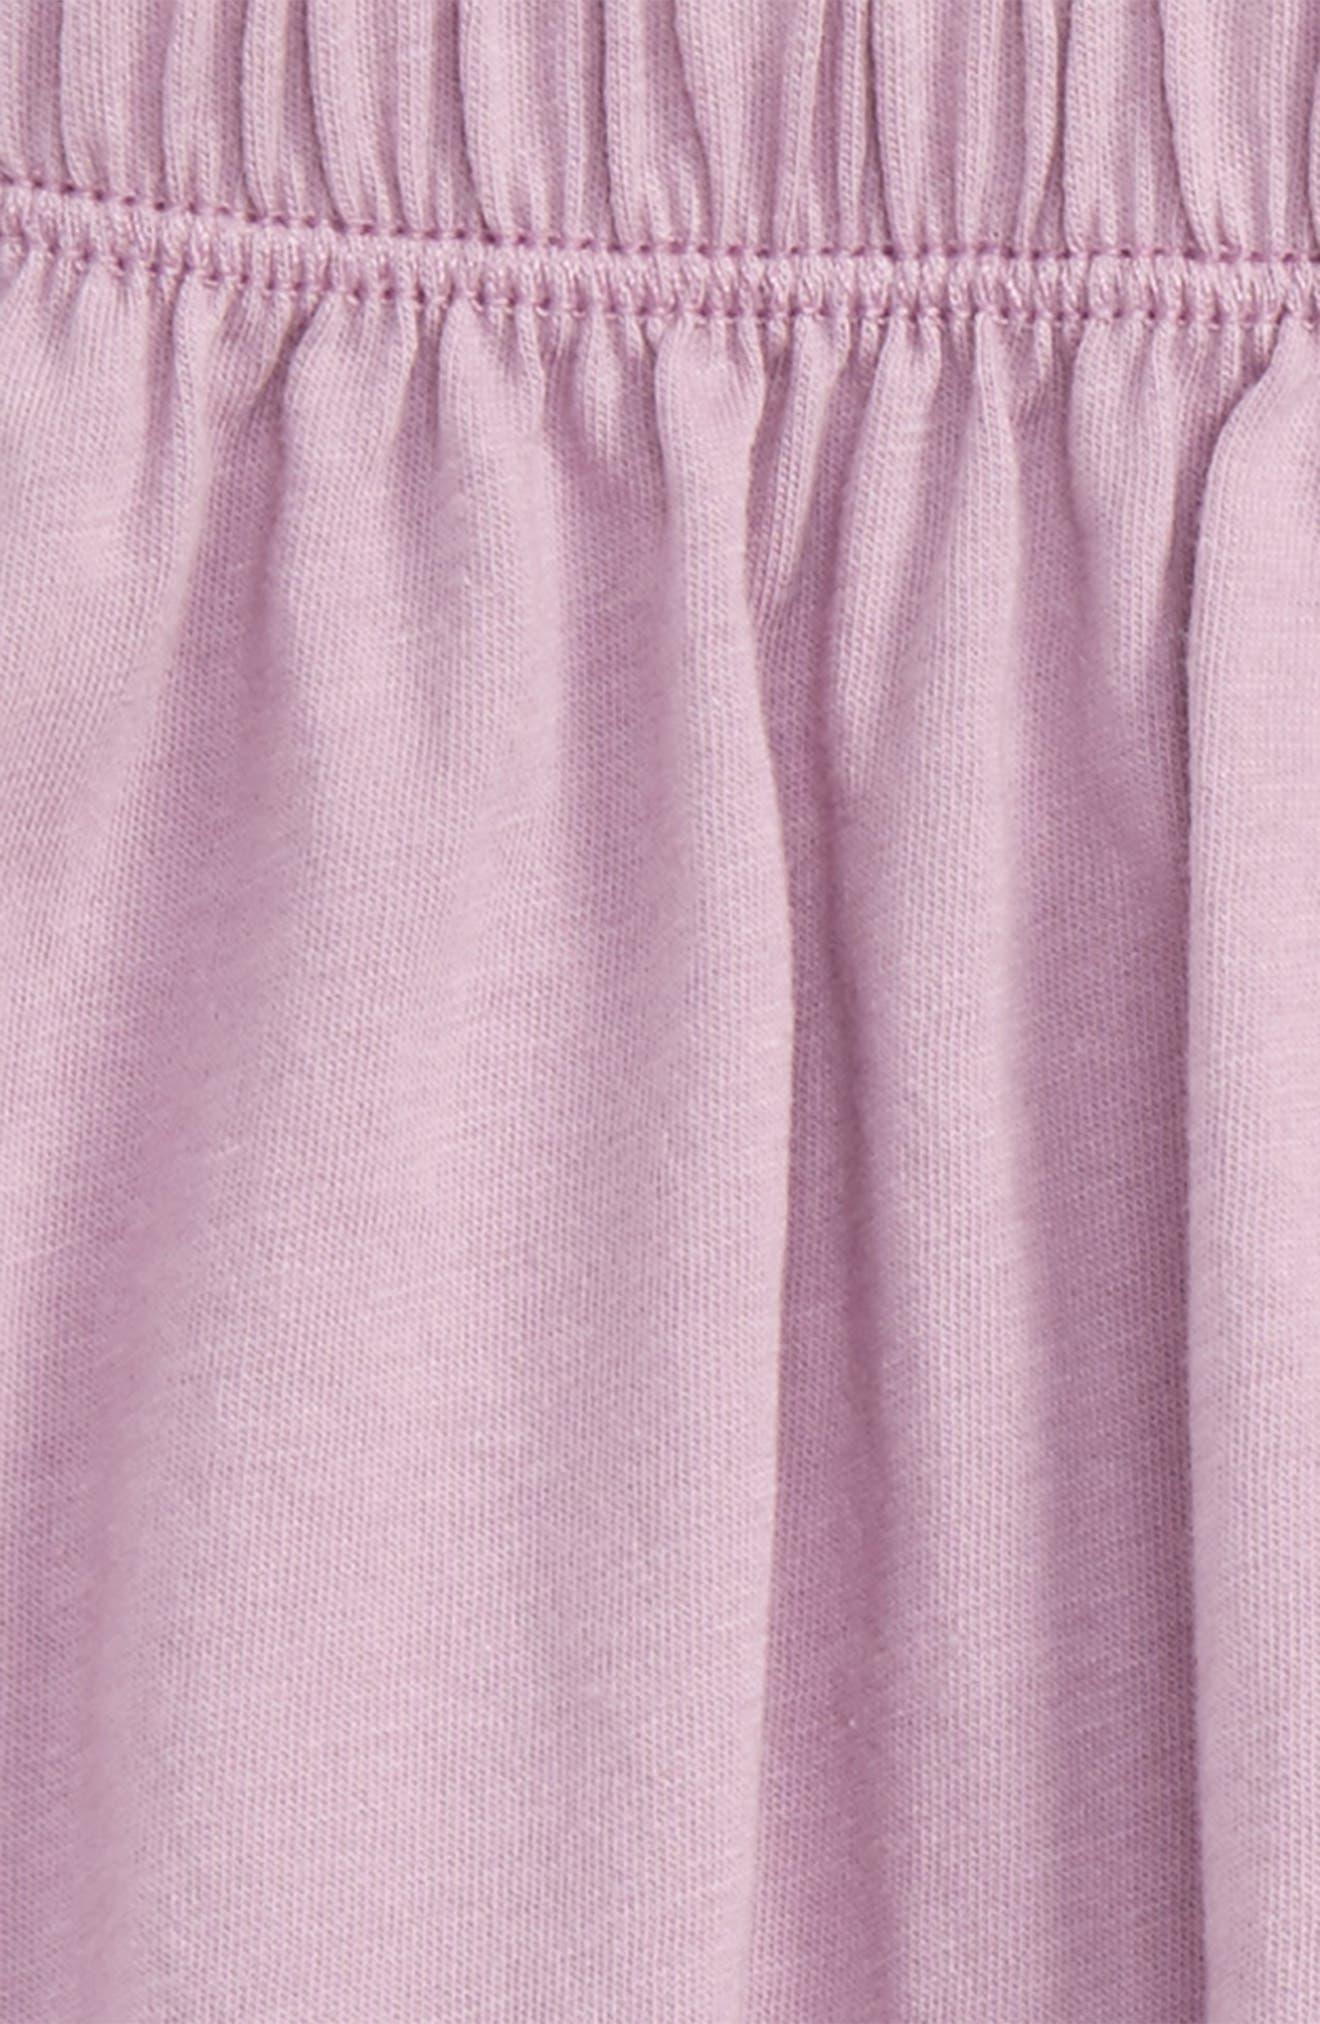 Alternate Image 2  - Peek Little Peanut - Happy Pants (Baby)